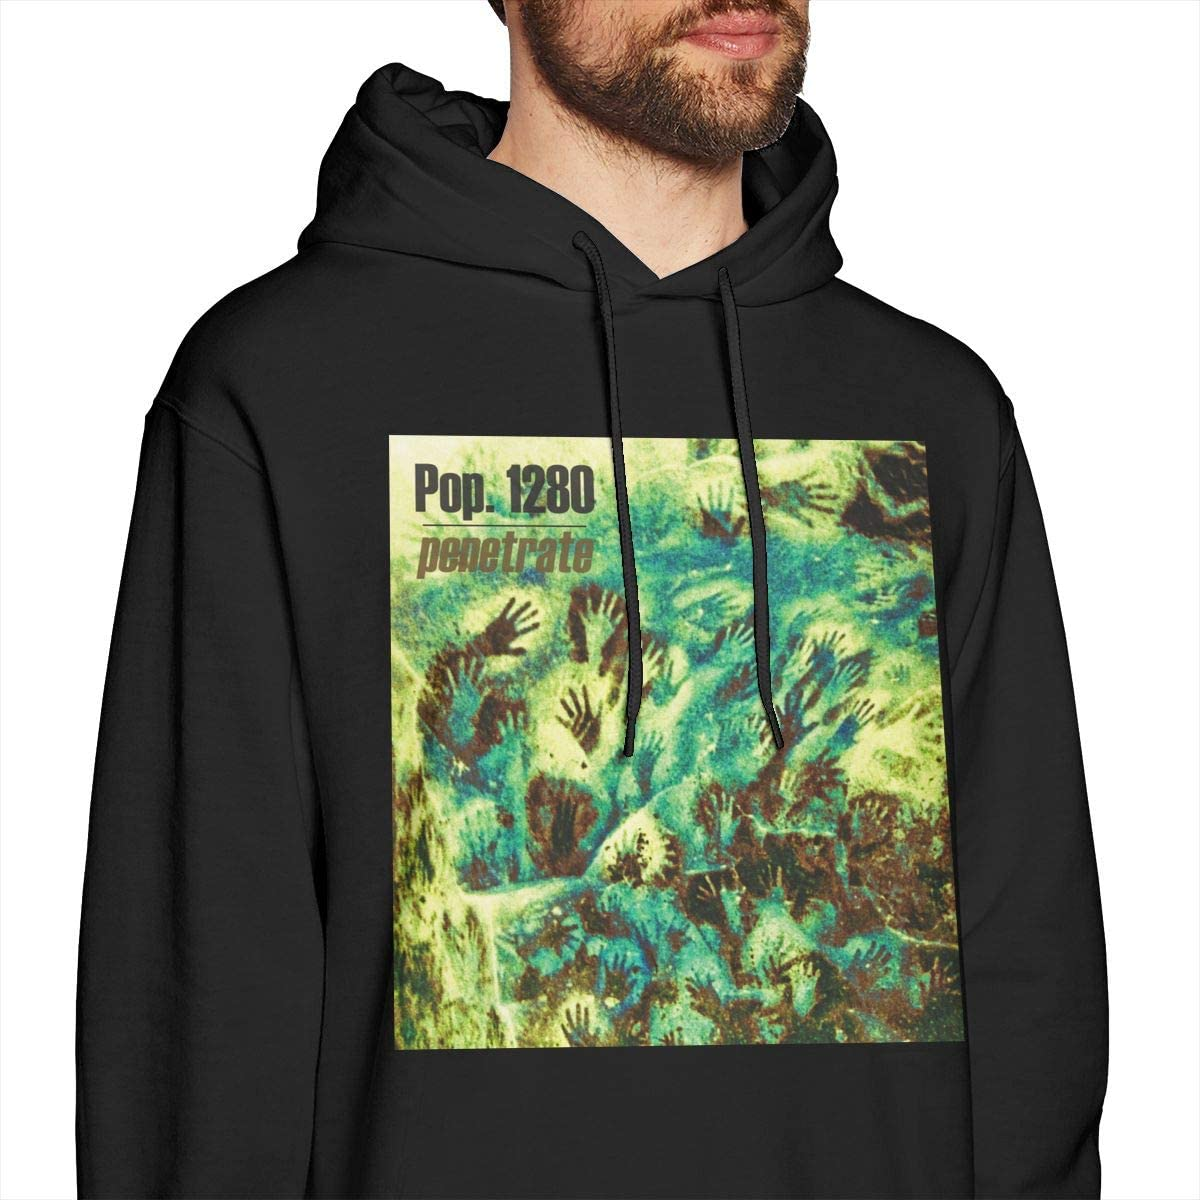 Duan Wuqing Pop 1280 Cool Mens Hat and Pocketless Sweater Black L